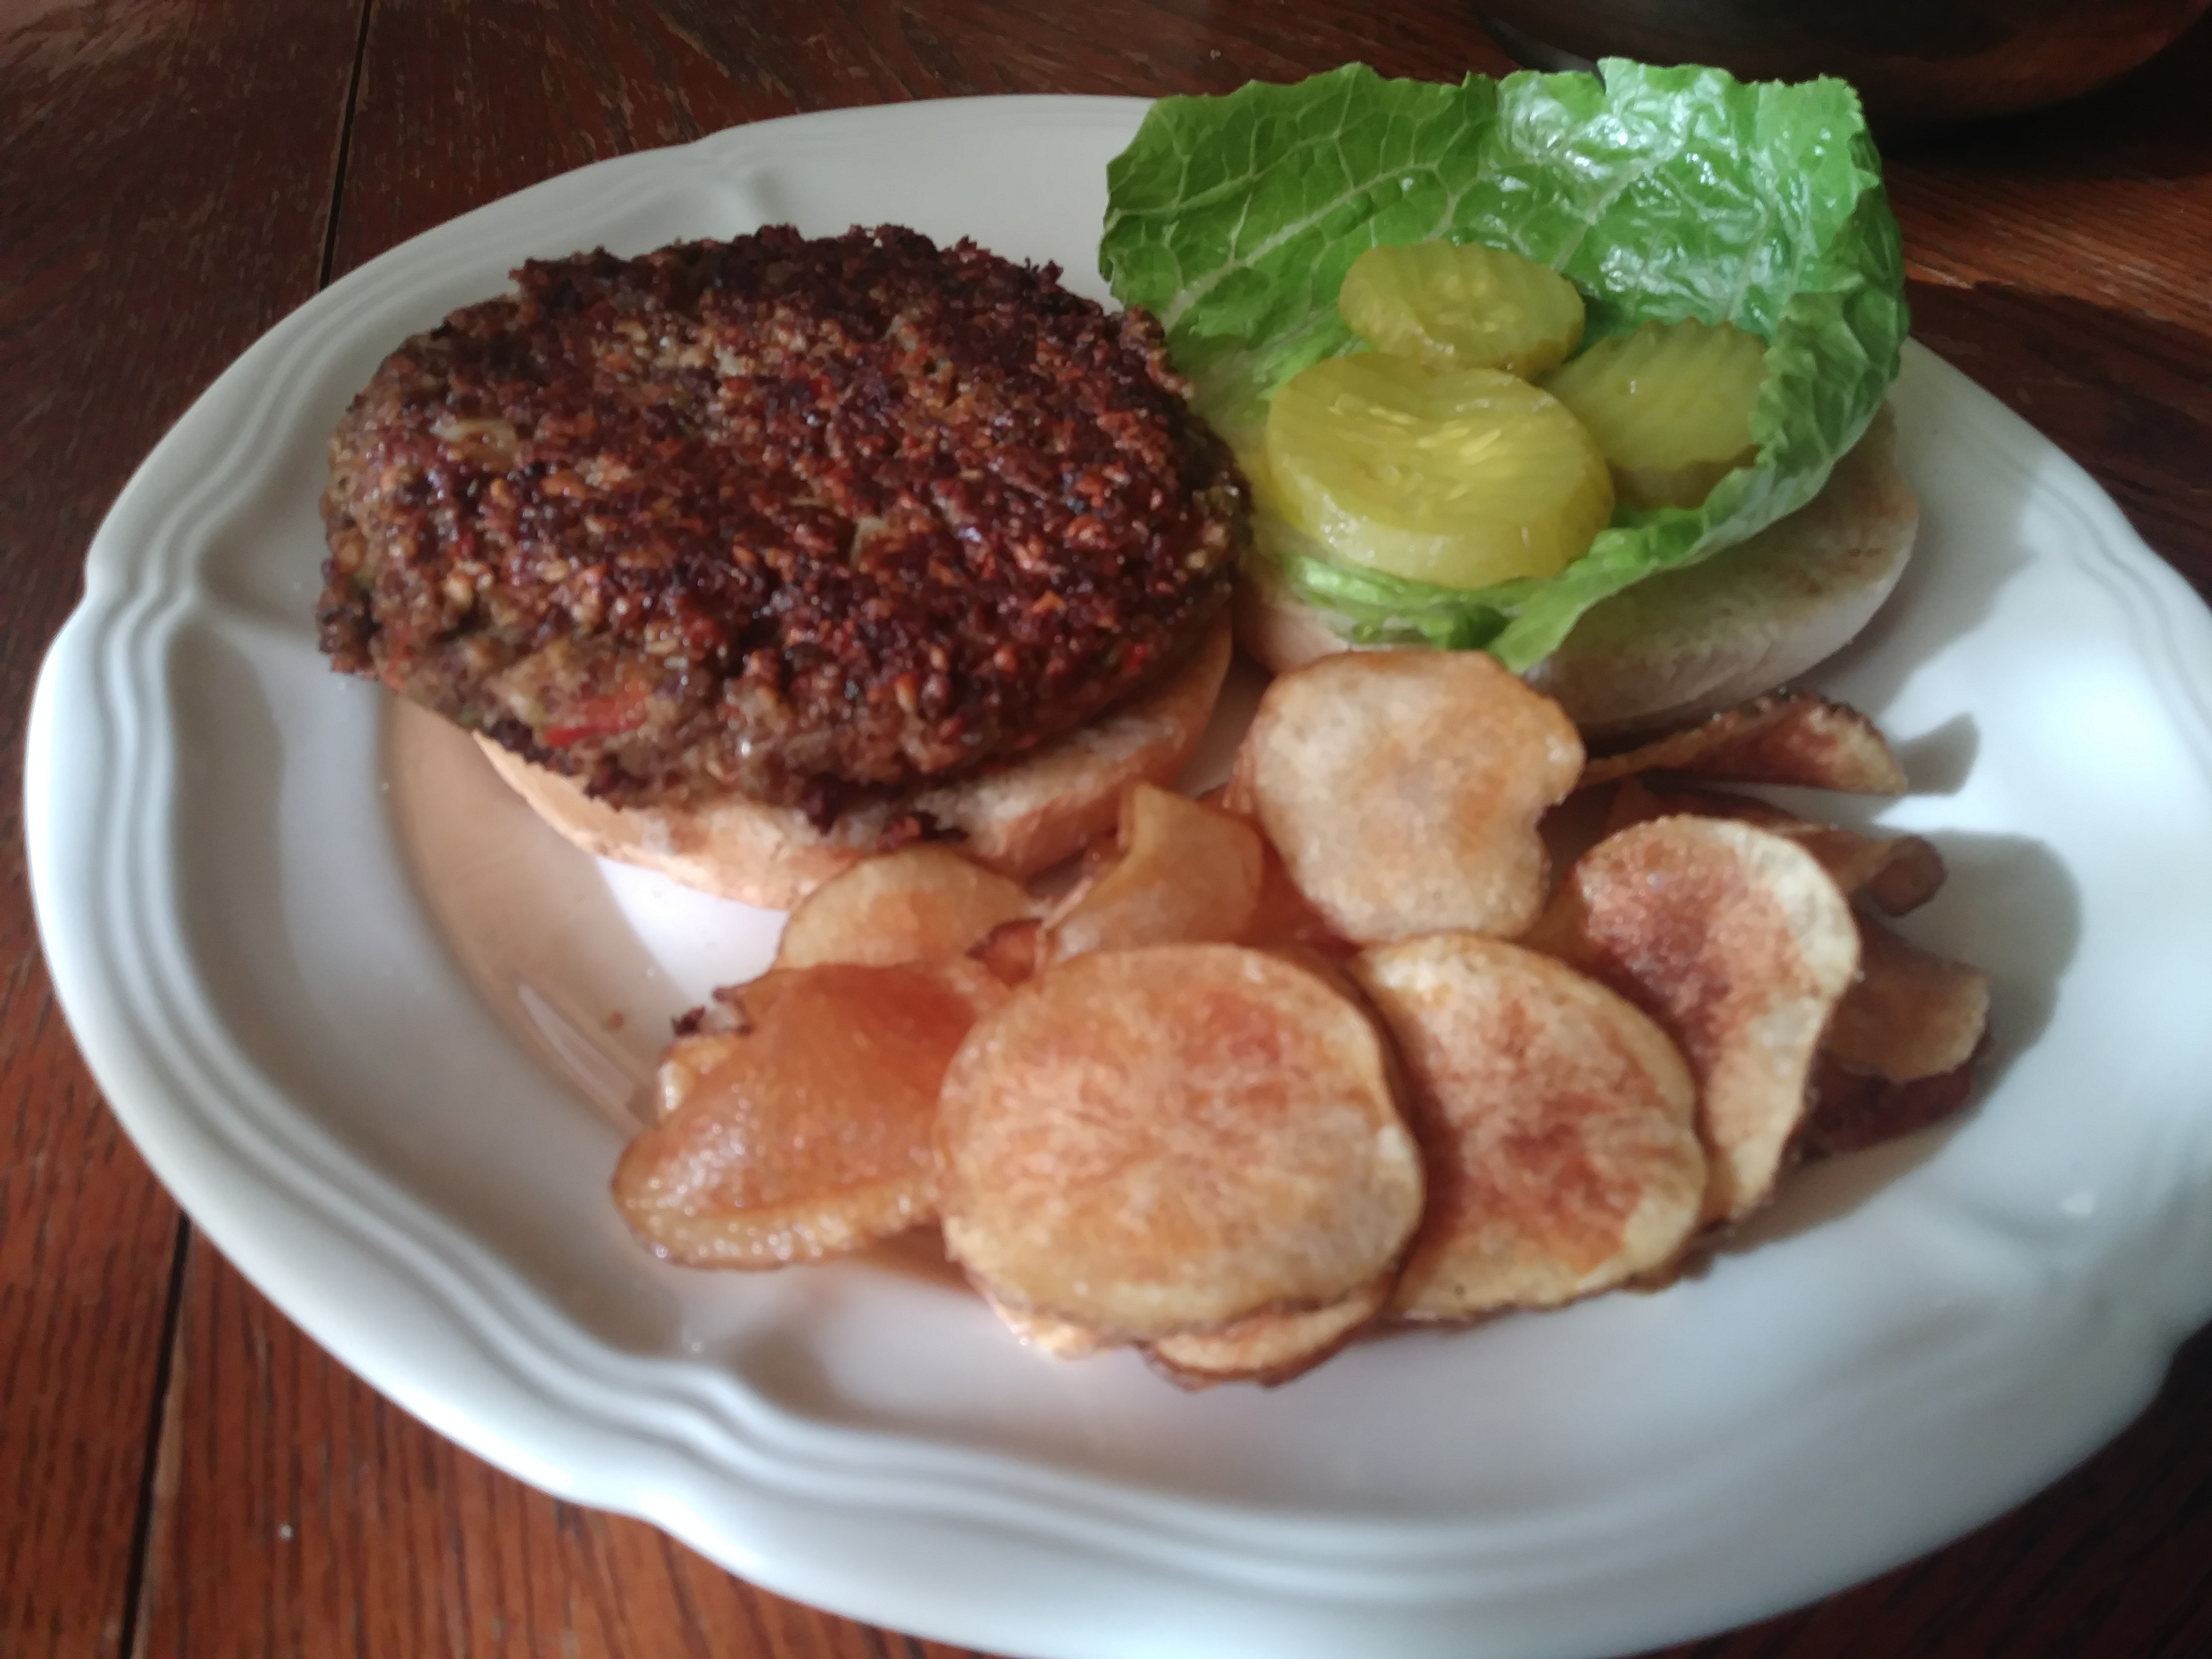 Vegan Black Bean Burgers with Oats